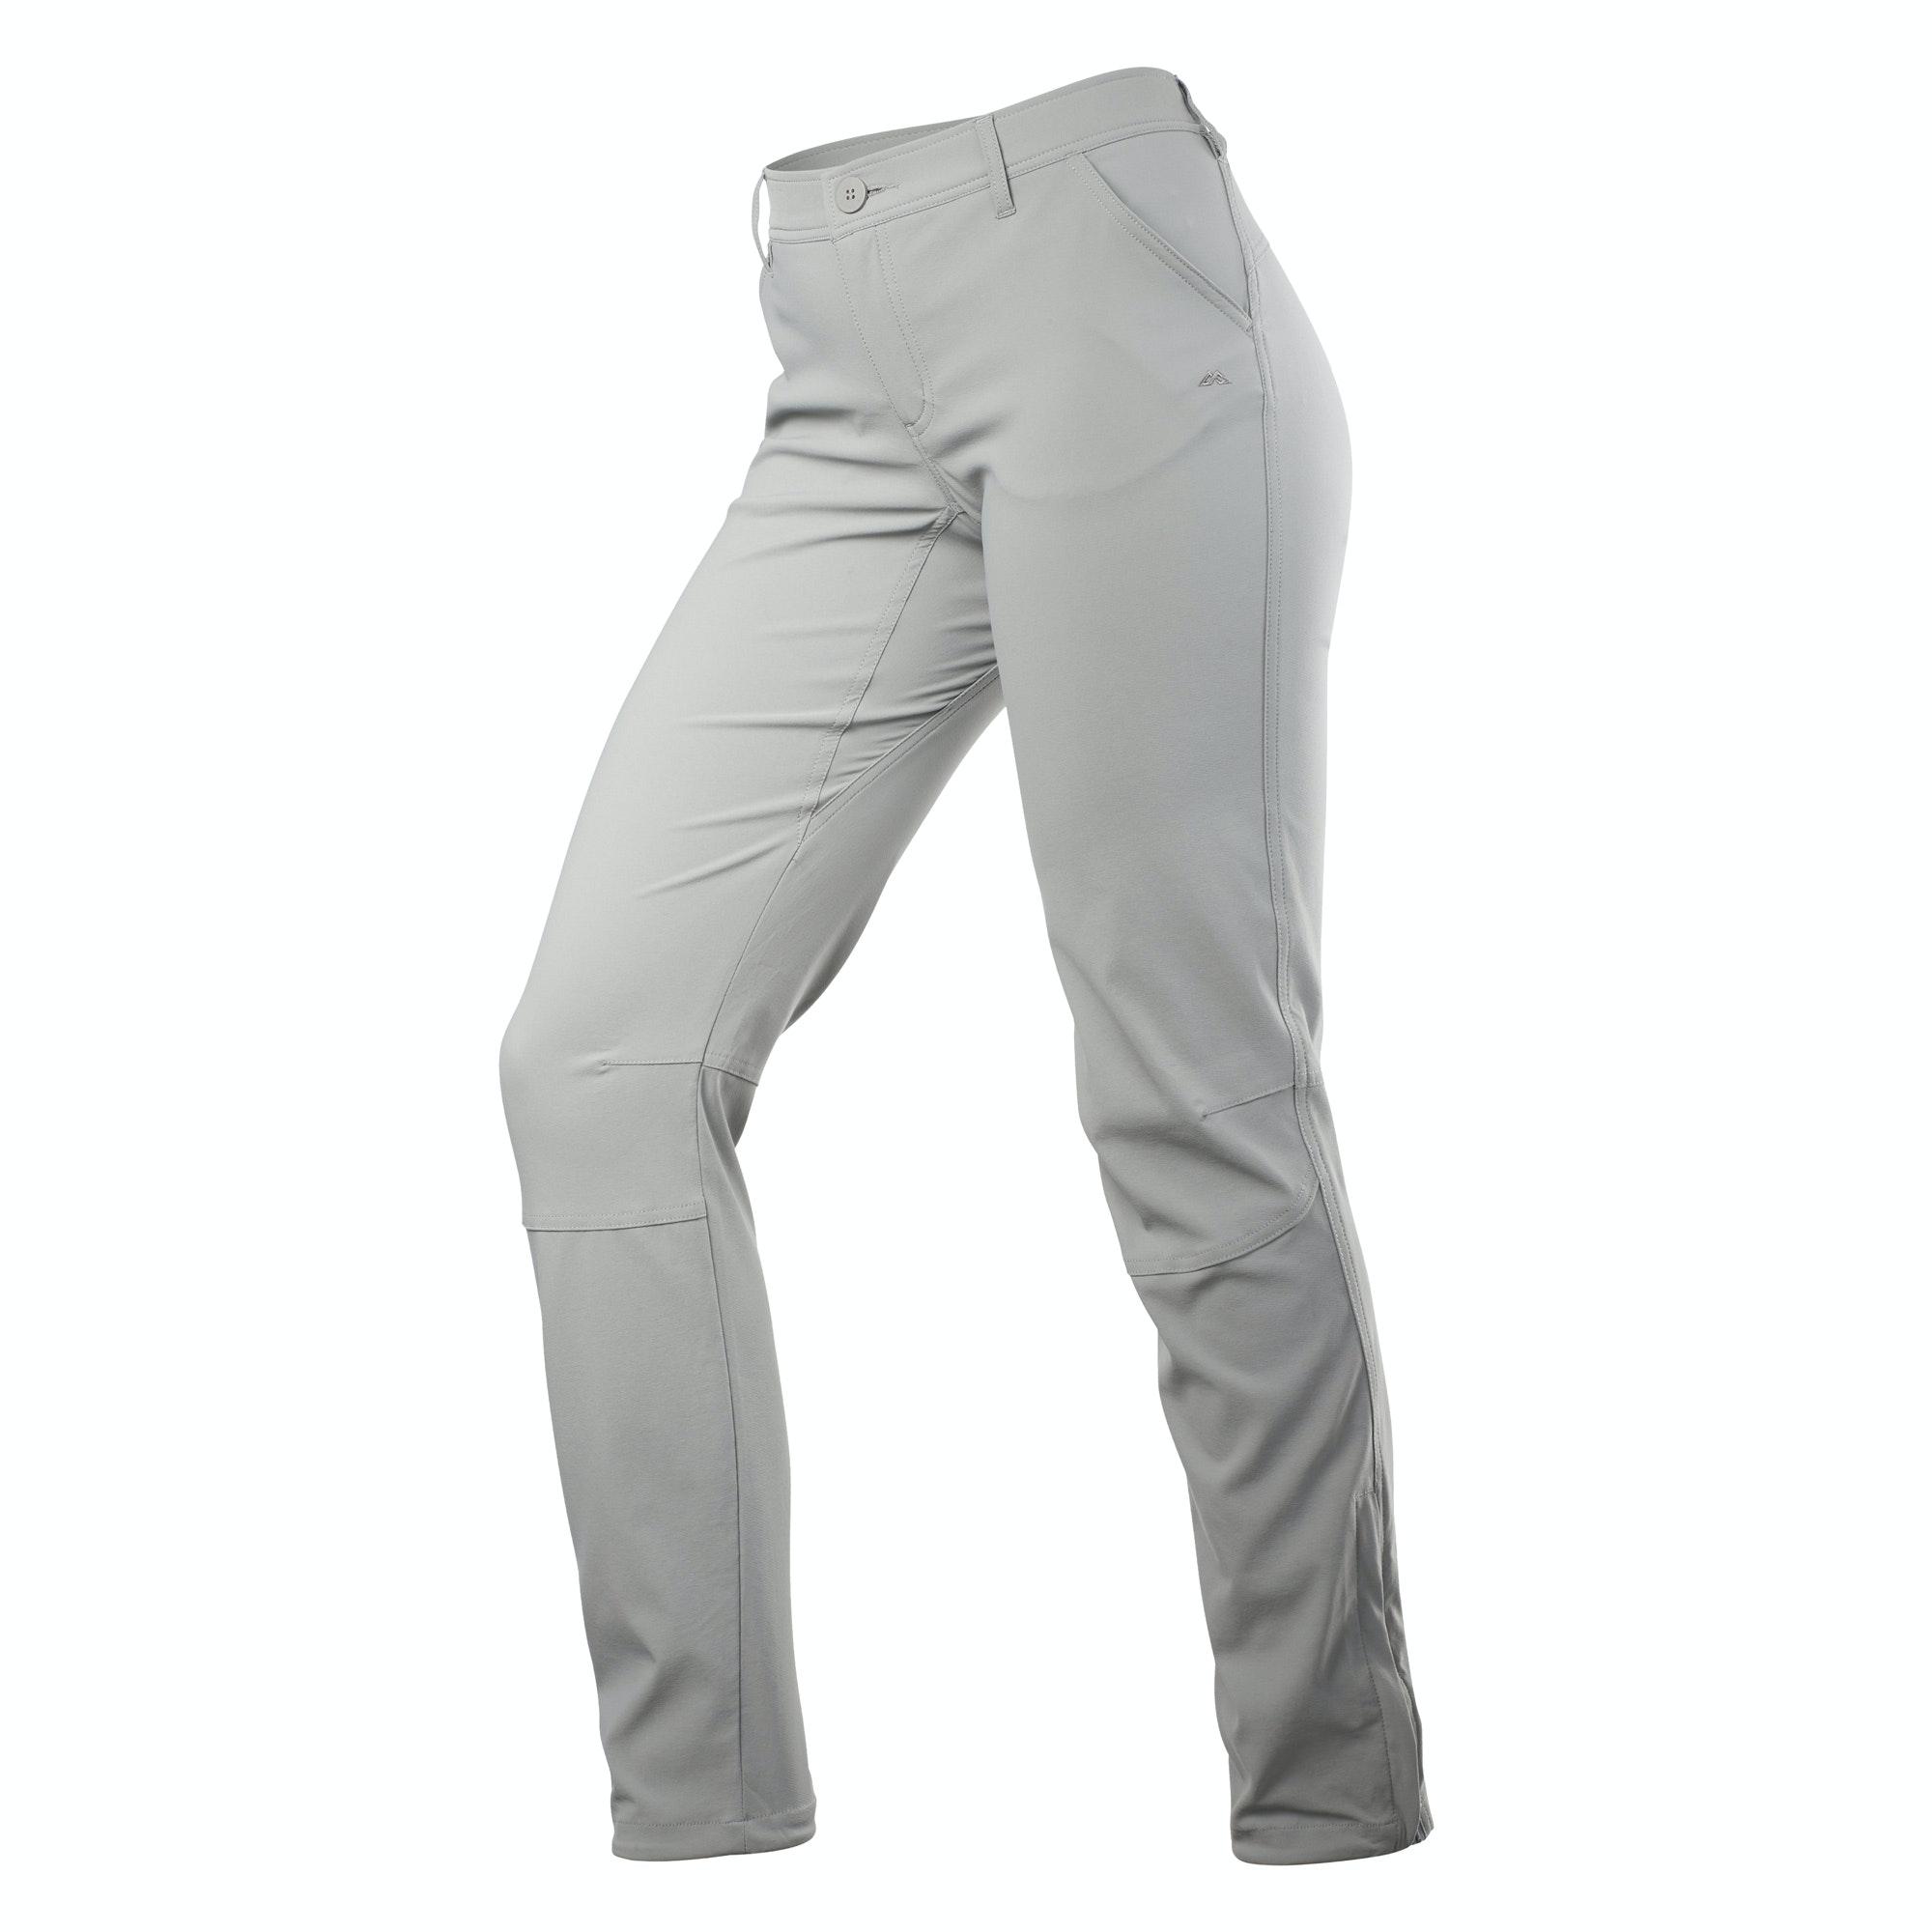 NEW-Kathmandu-Eris-Women-039-s-Softshell-Hiking-Pants-Trousers-v2-Zip-Hem-Over-Boots thumbnail 12